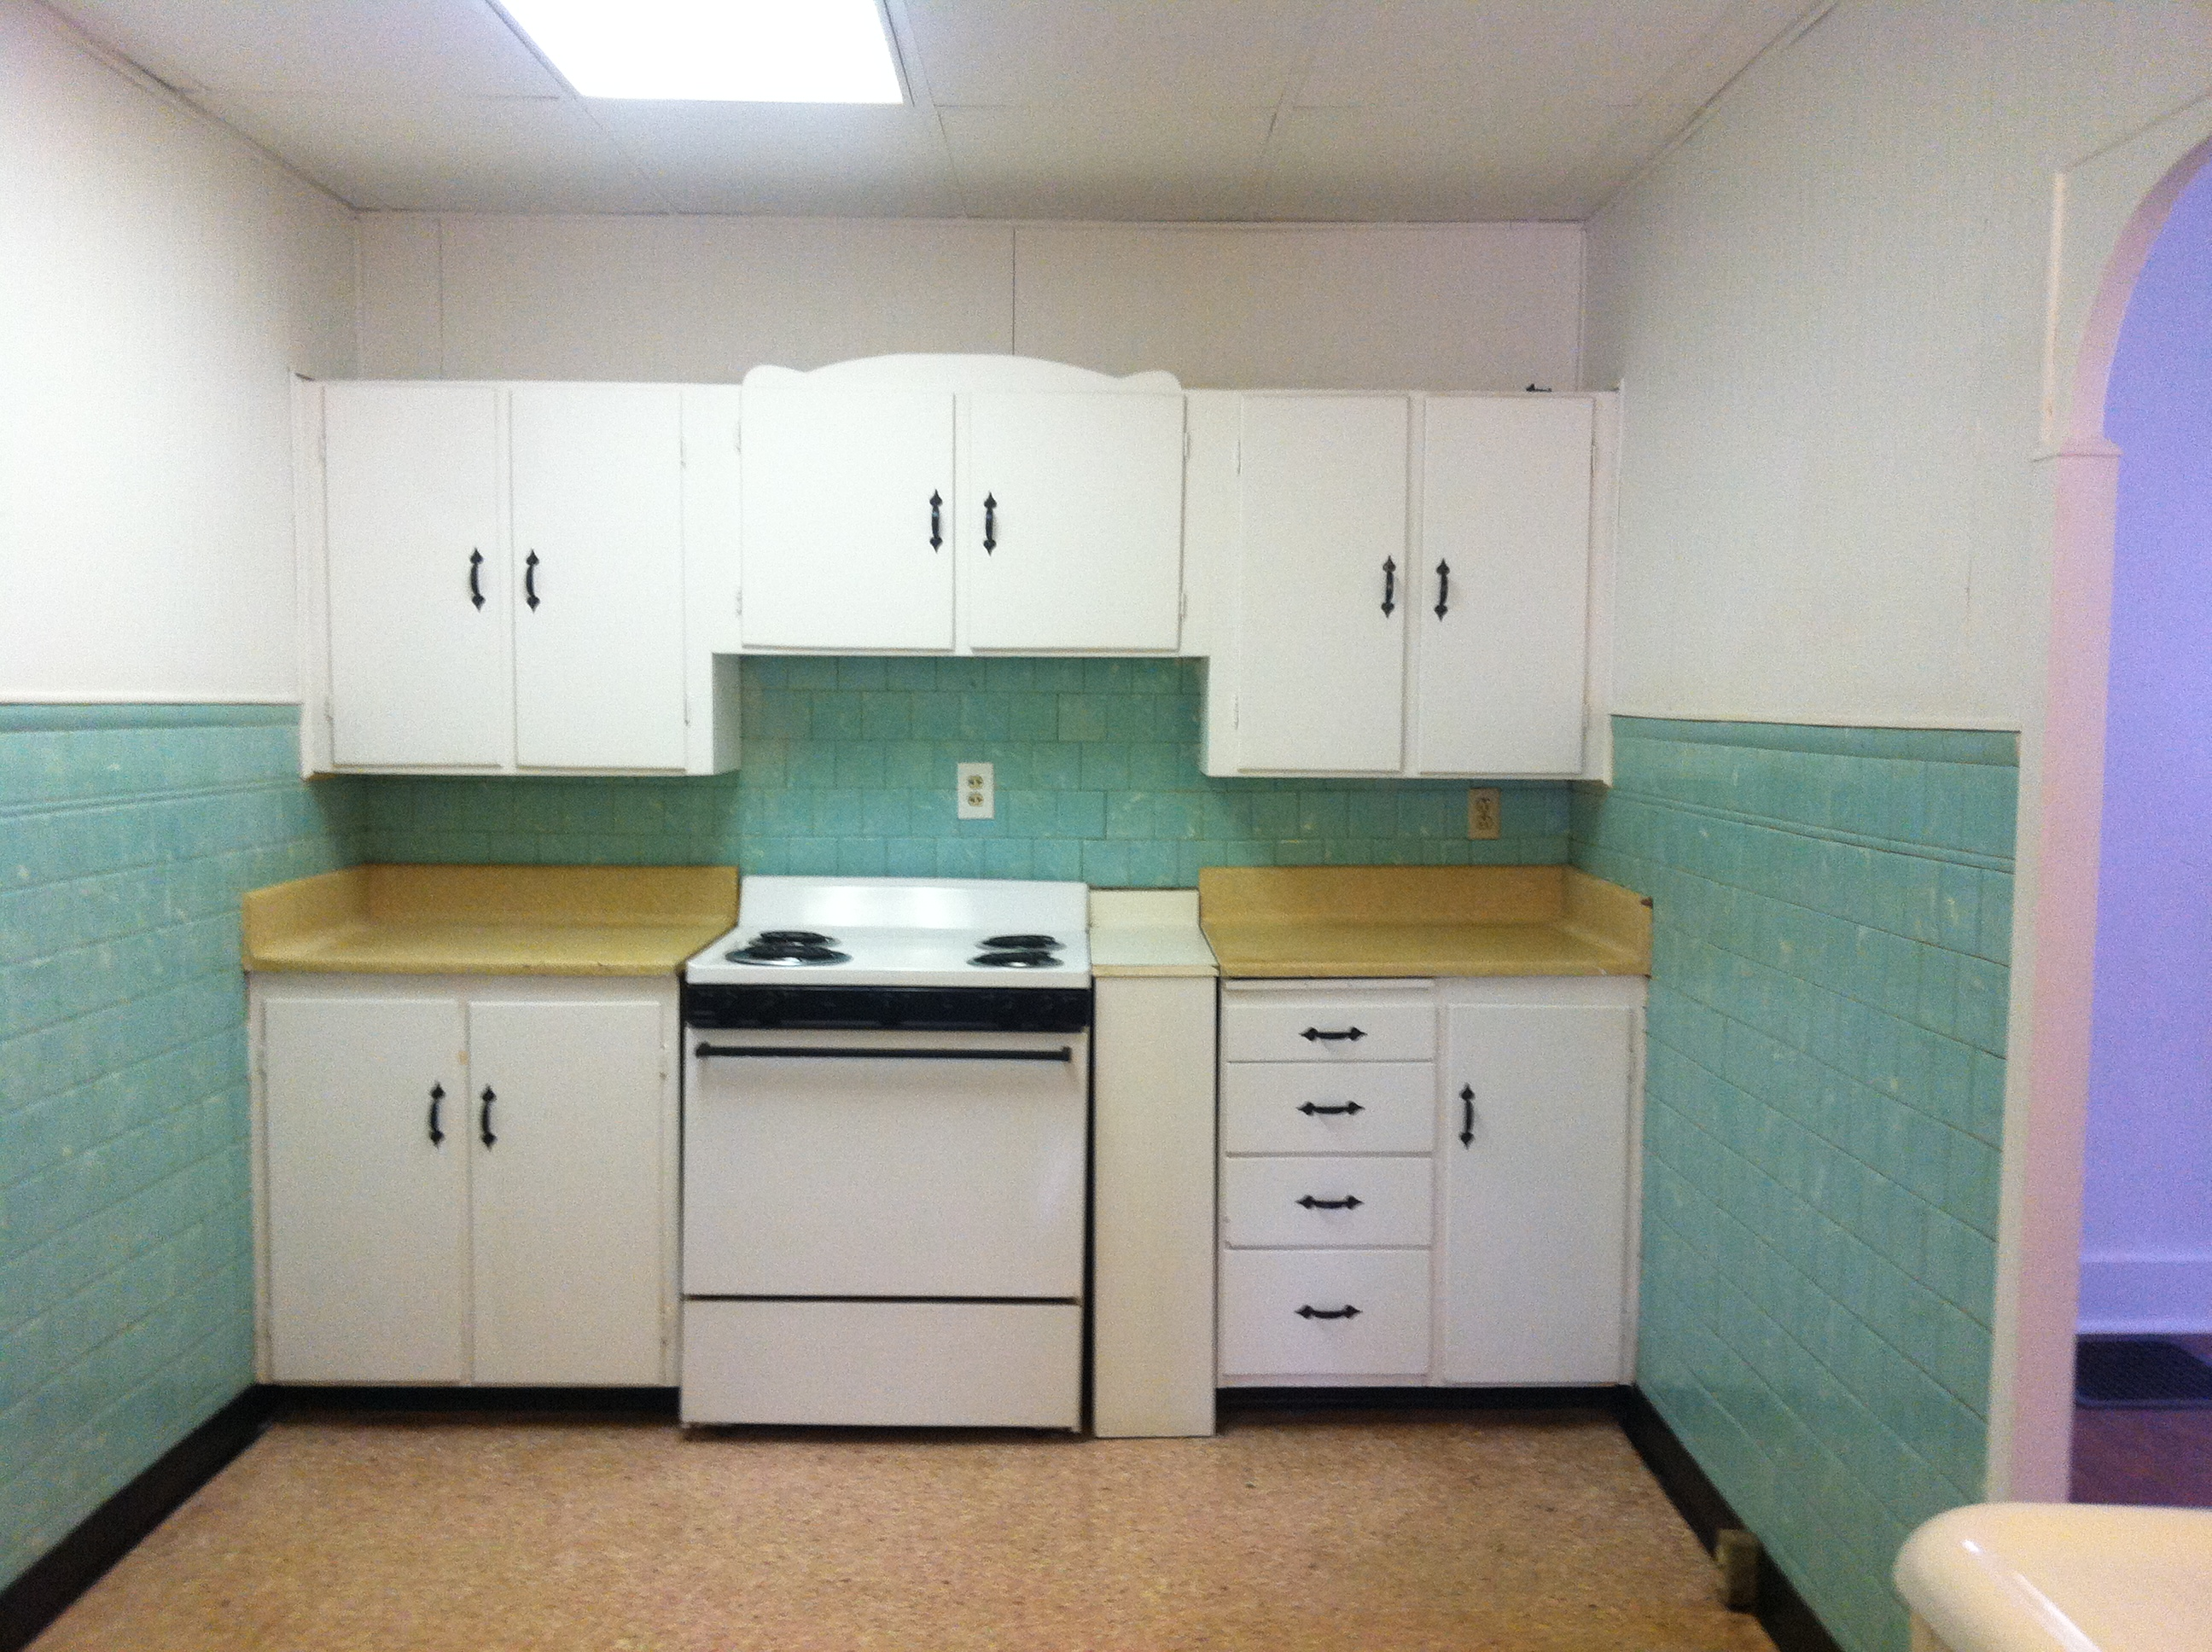 848 South Main Street, Fort Scott, Bourbon County, Kansas, United States 66701, 1 Bedroom Bedrooms, ,1 BathroomBathrooms,Apartment,For Rent,South Main Street,1,1004